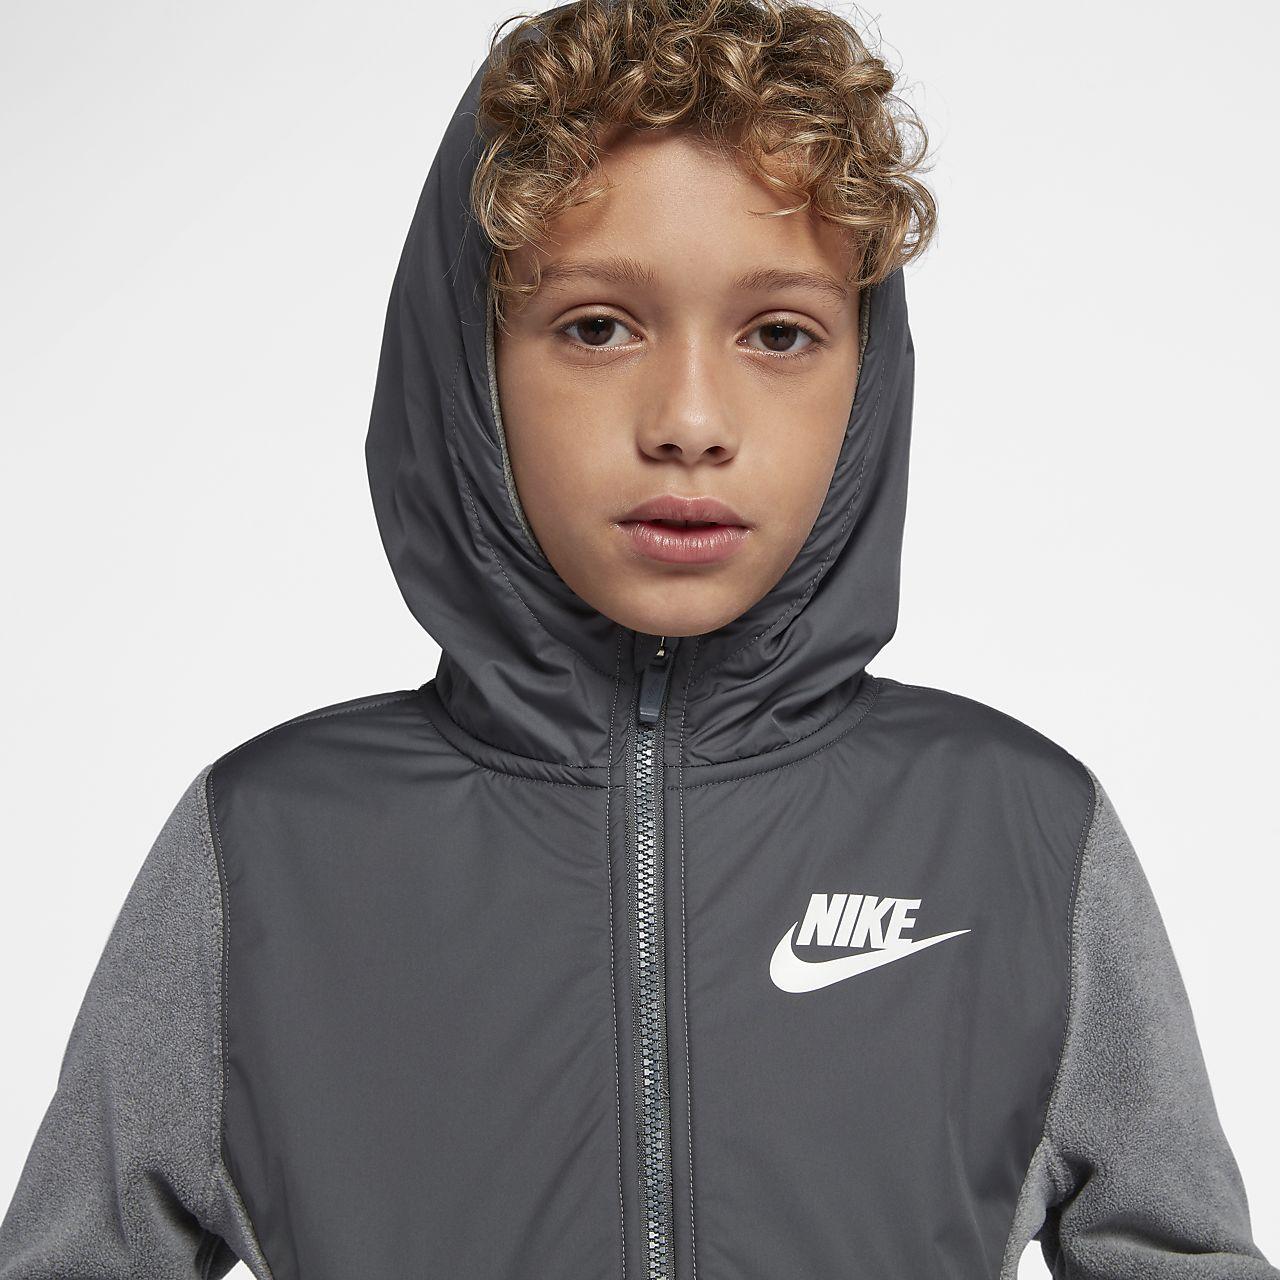 felpa nike 12 anni ragazzo